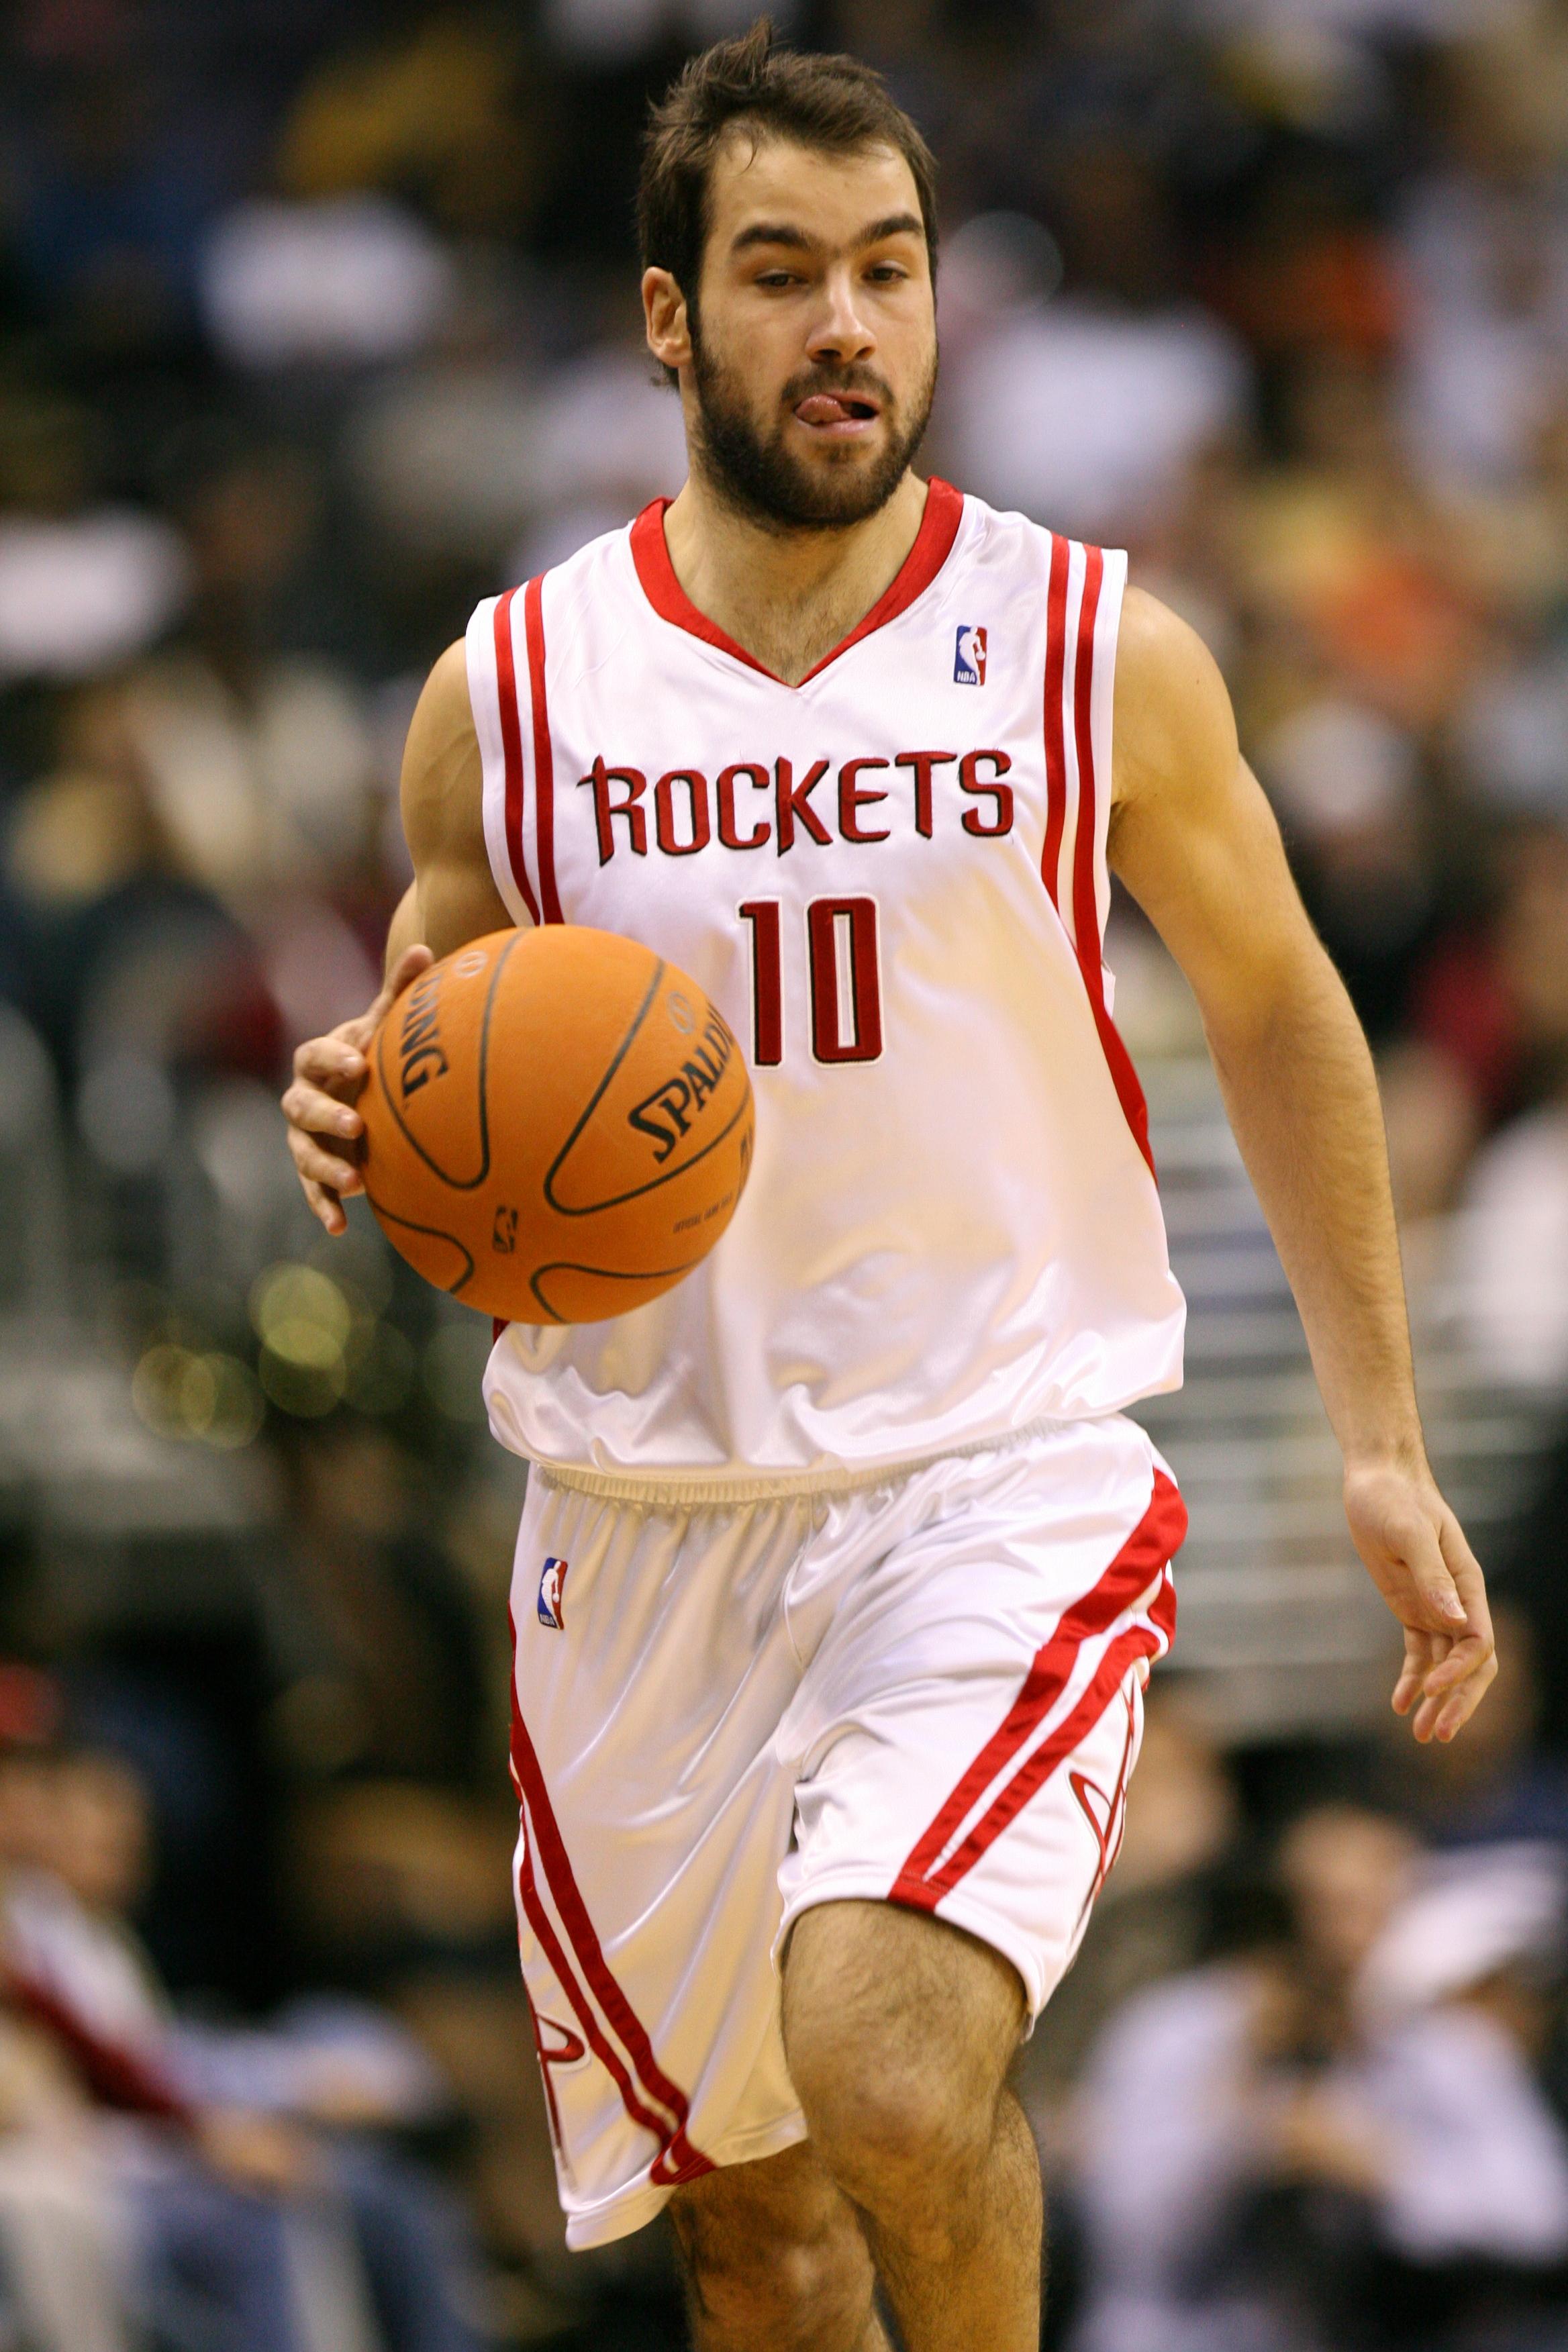 Rockets Nba Players